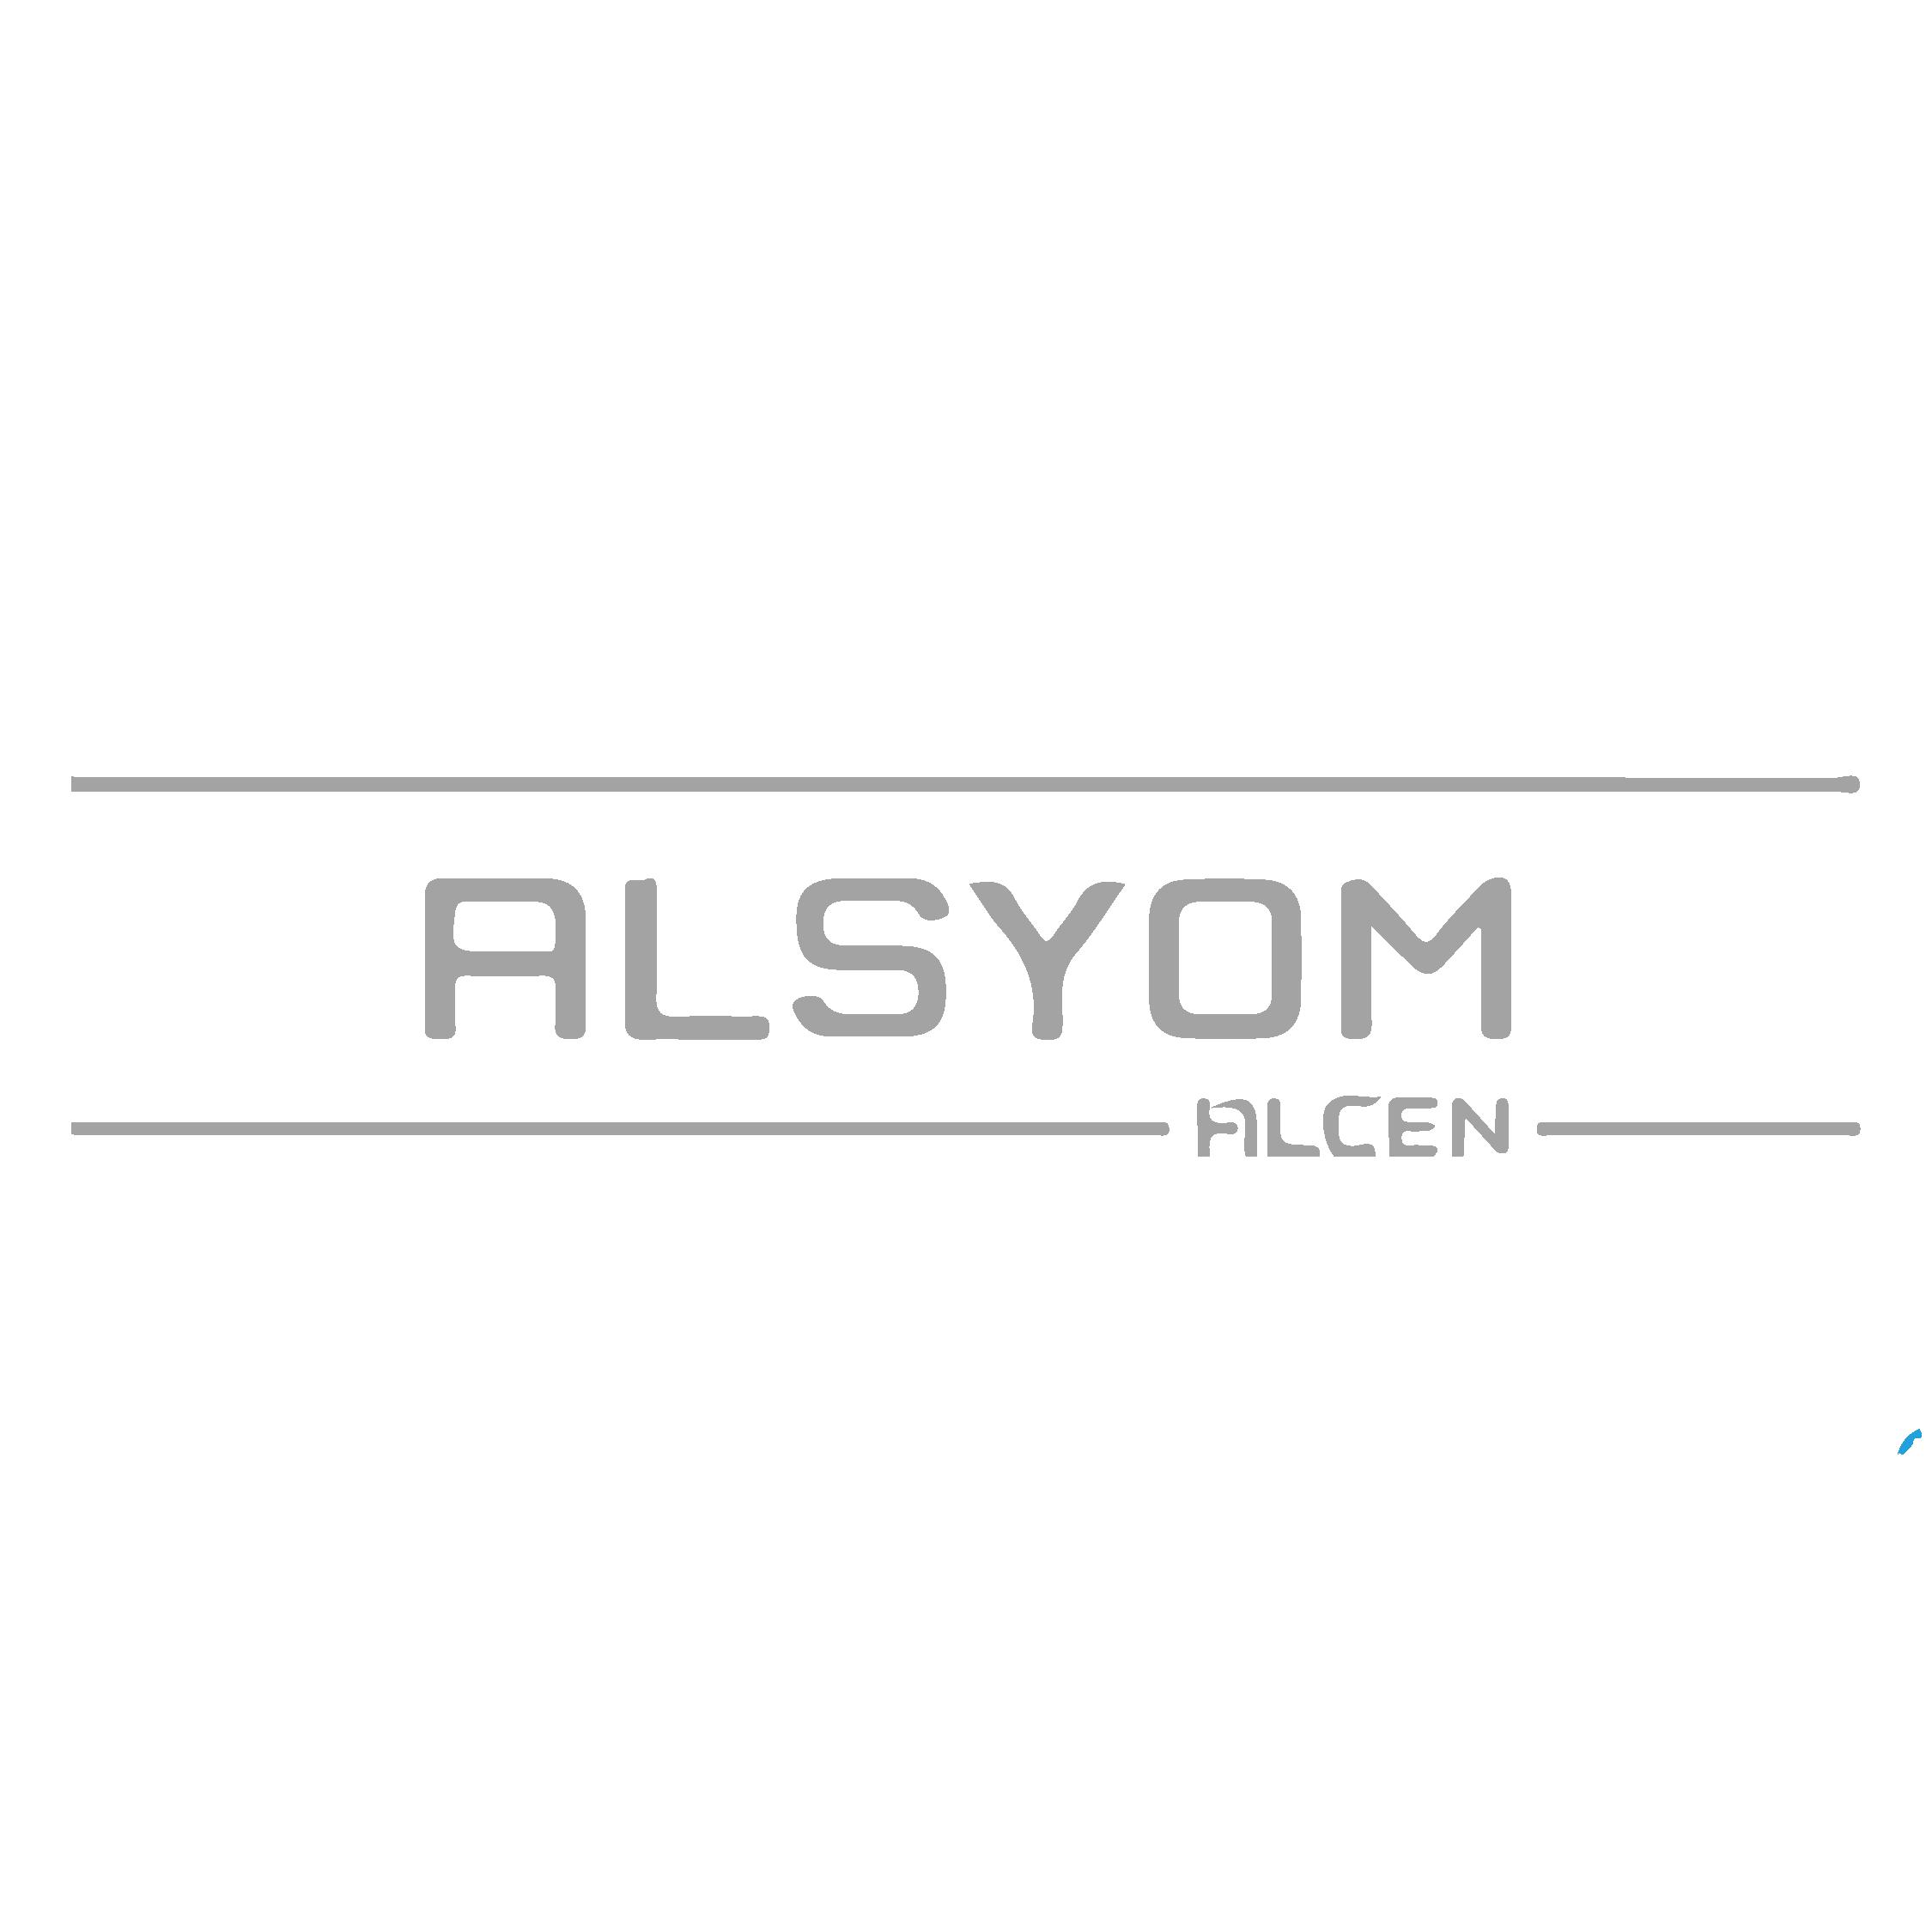 Logo Alsyom - Agence de communication Break-Out Company